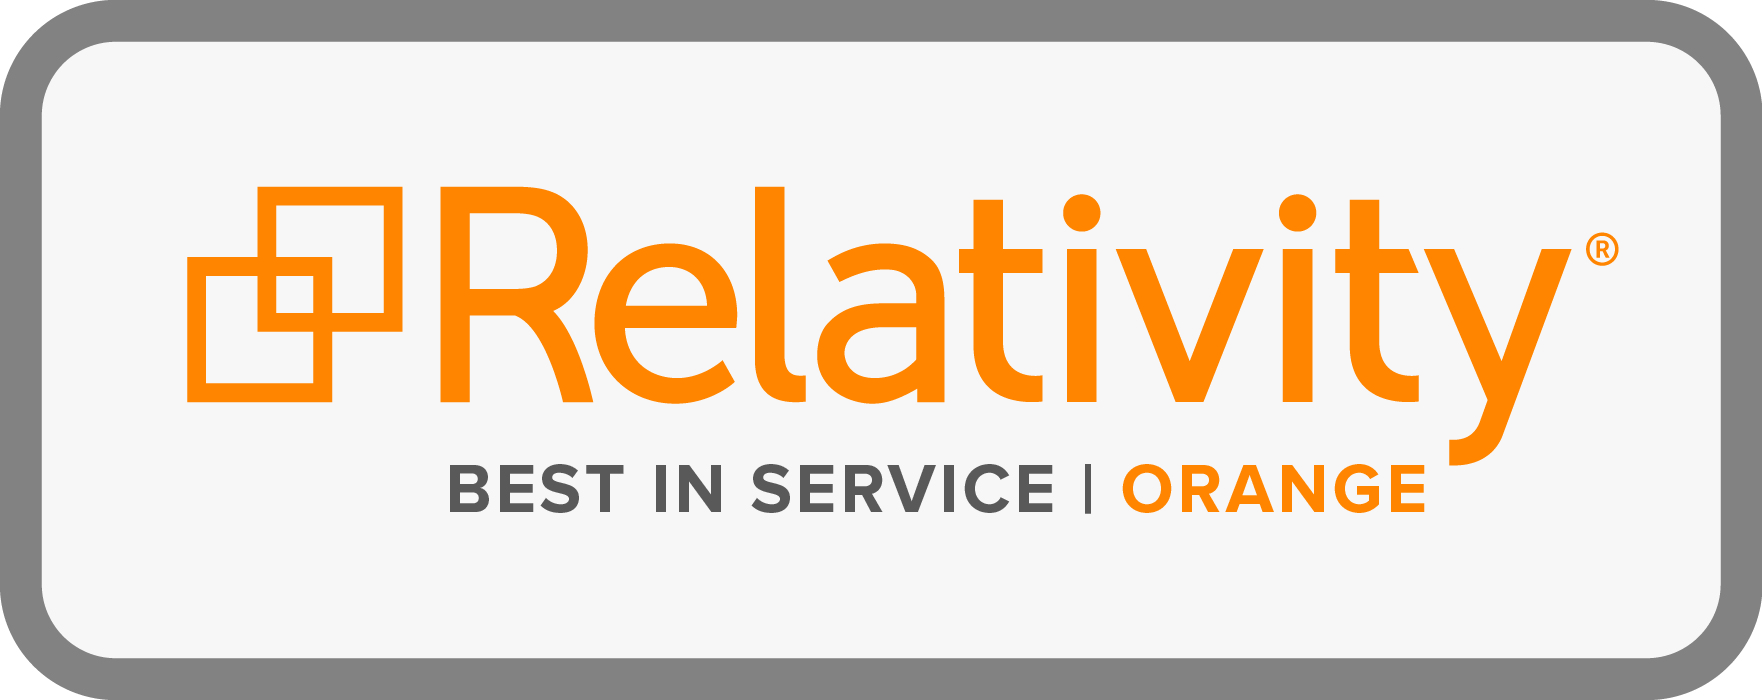 relativity_best in service orange_cmyk_300.jpg